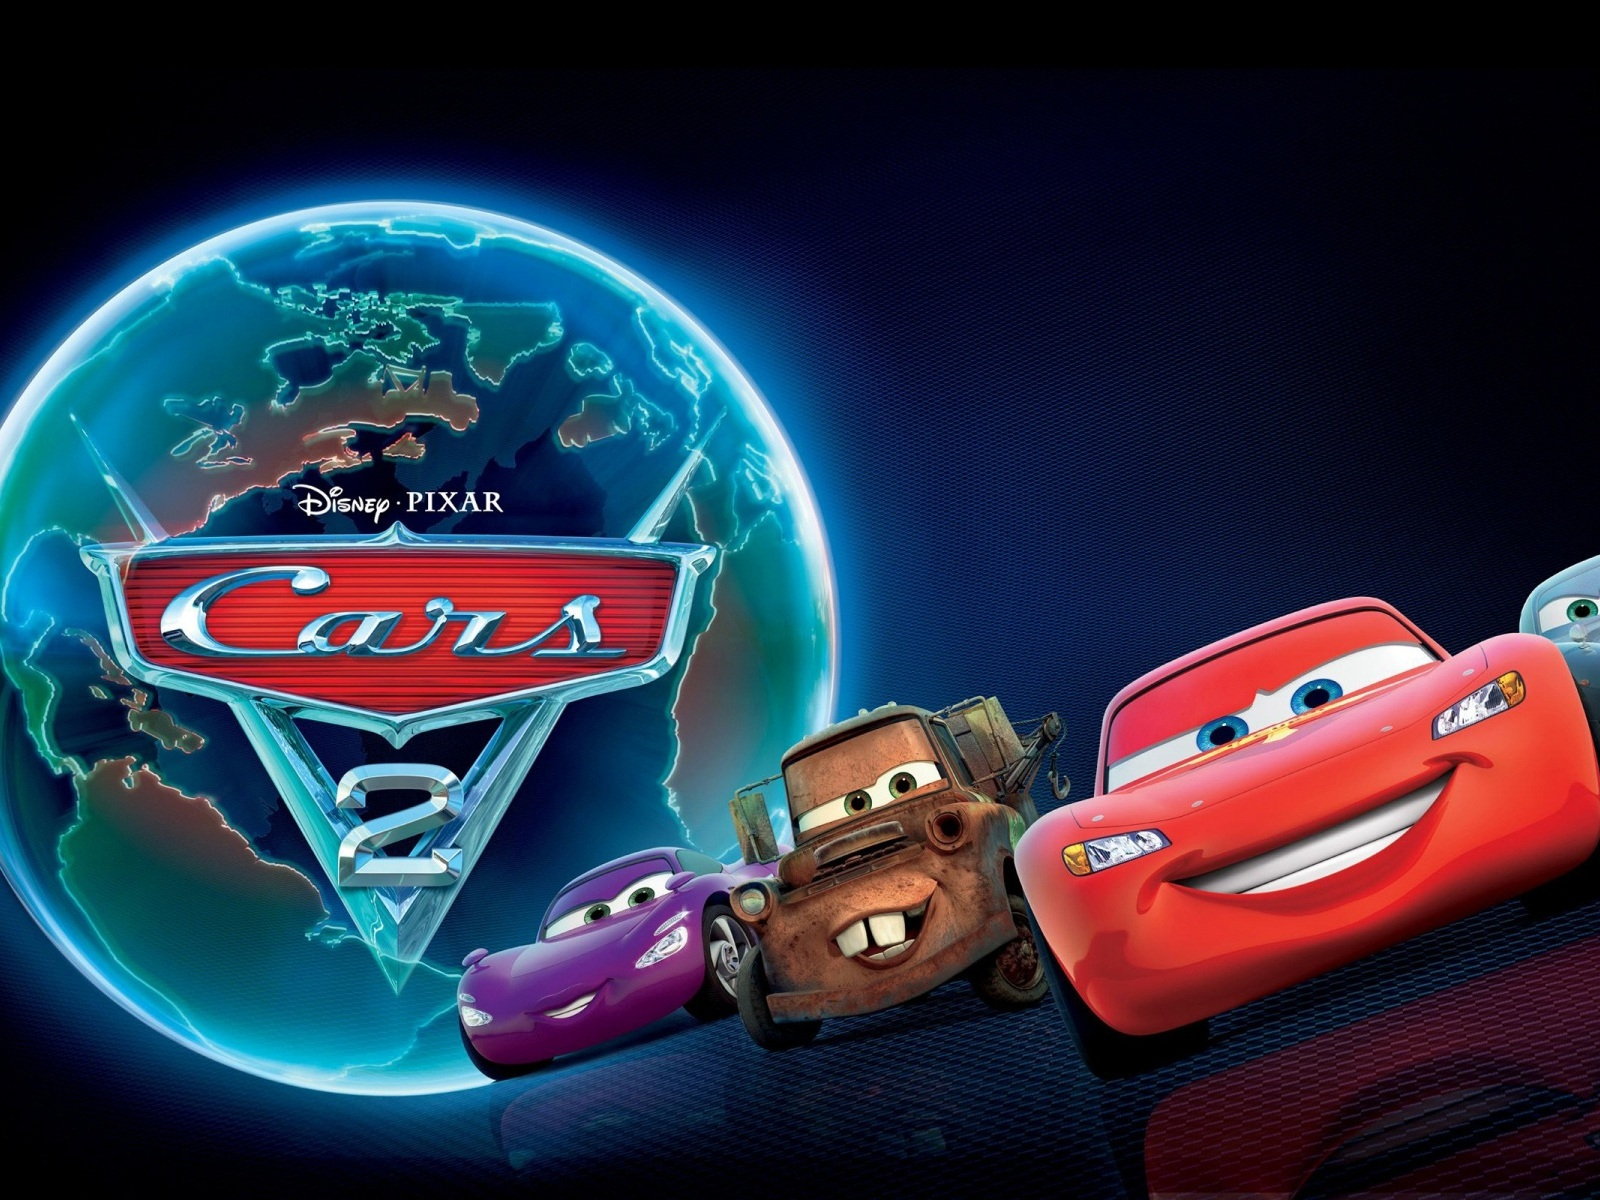 http://3.bp.blogspot.com/-WS22mbb-nMo/Twq2N2rUttI/AAAAAAAABOI/O3RVbSAen_s/s1600/Car+2+Disney+Pixar+Wallpaper.jpg